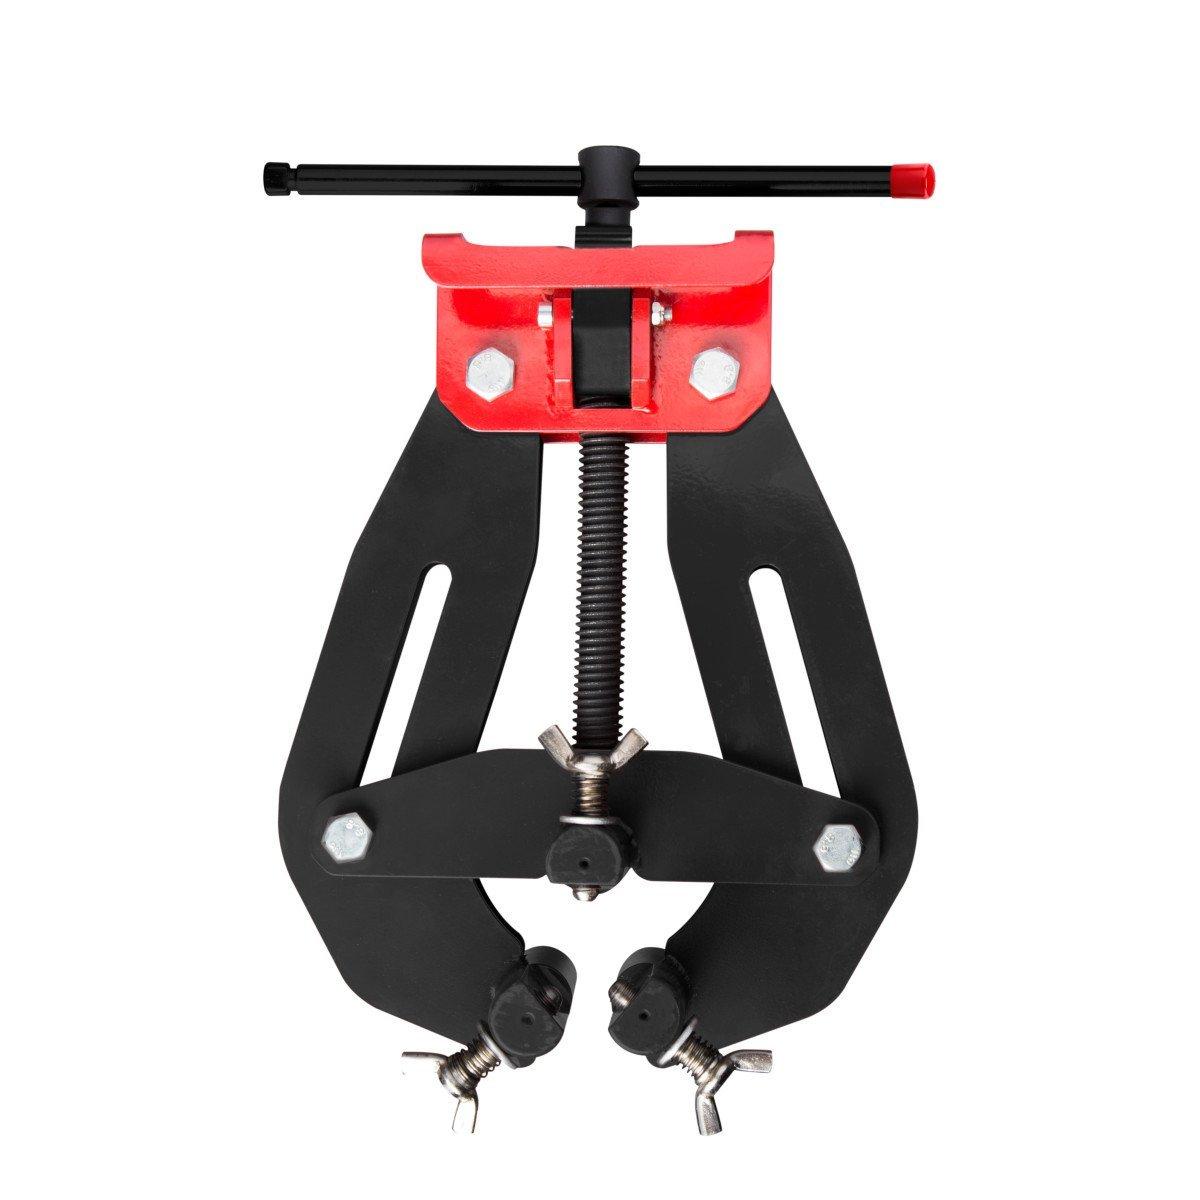 steelman PRO 99025 ống quickalign clip, 15.2 cm